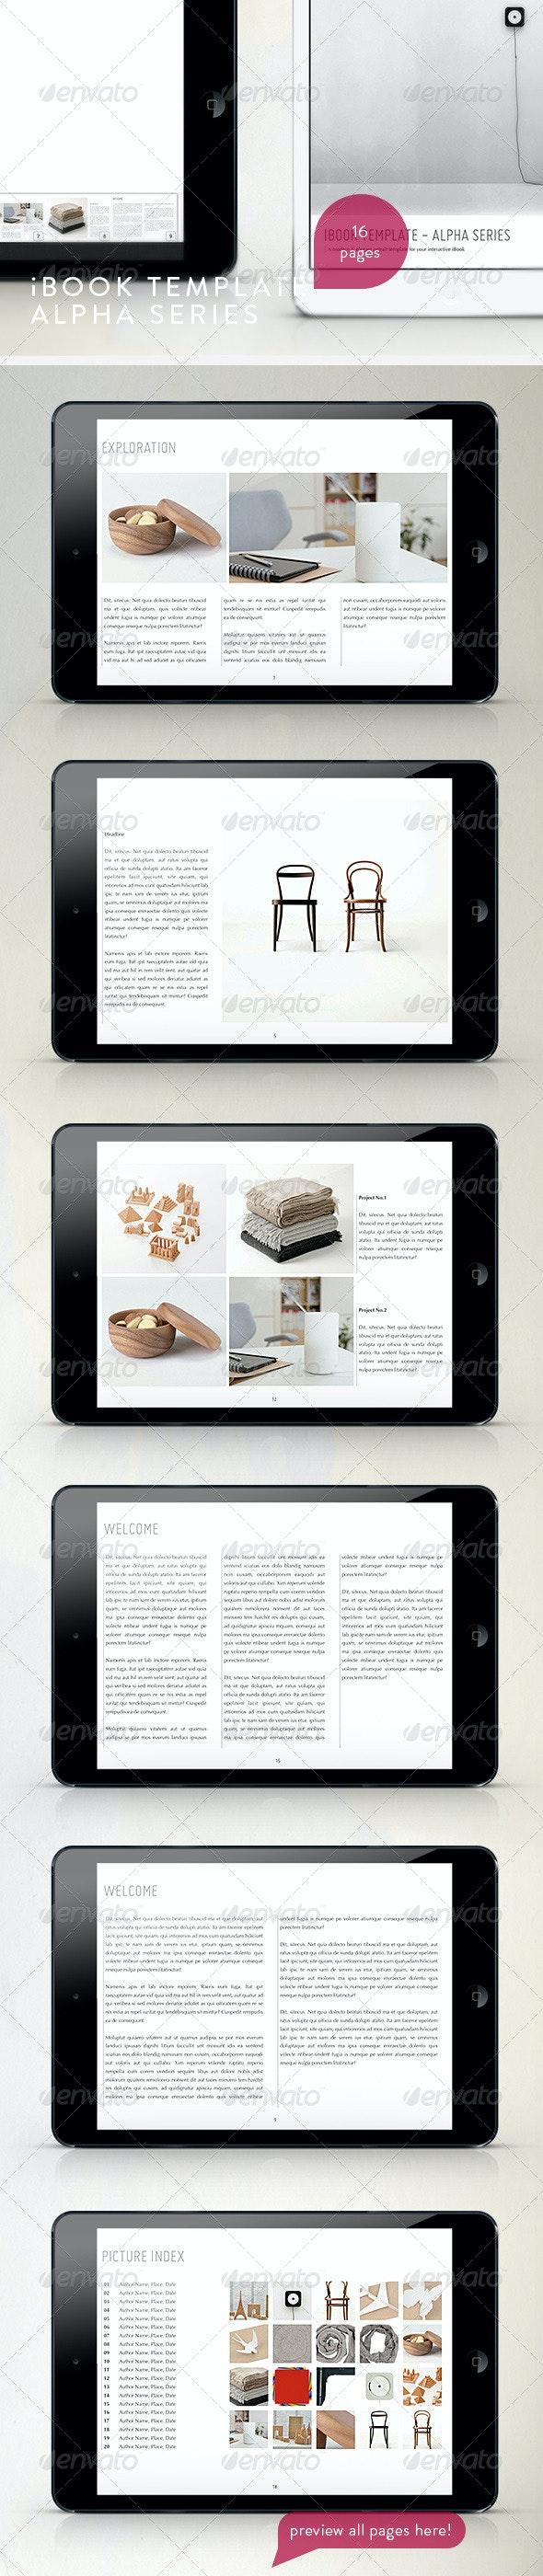 Modern Tablet Templete - Vol.2 - Digital Books ePublishing